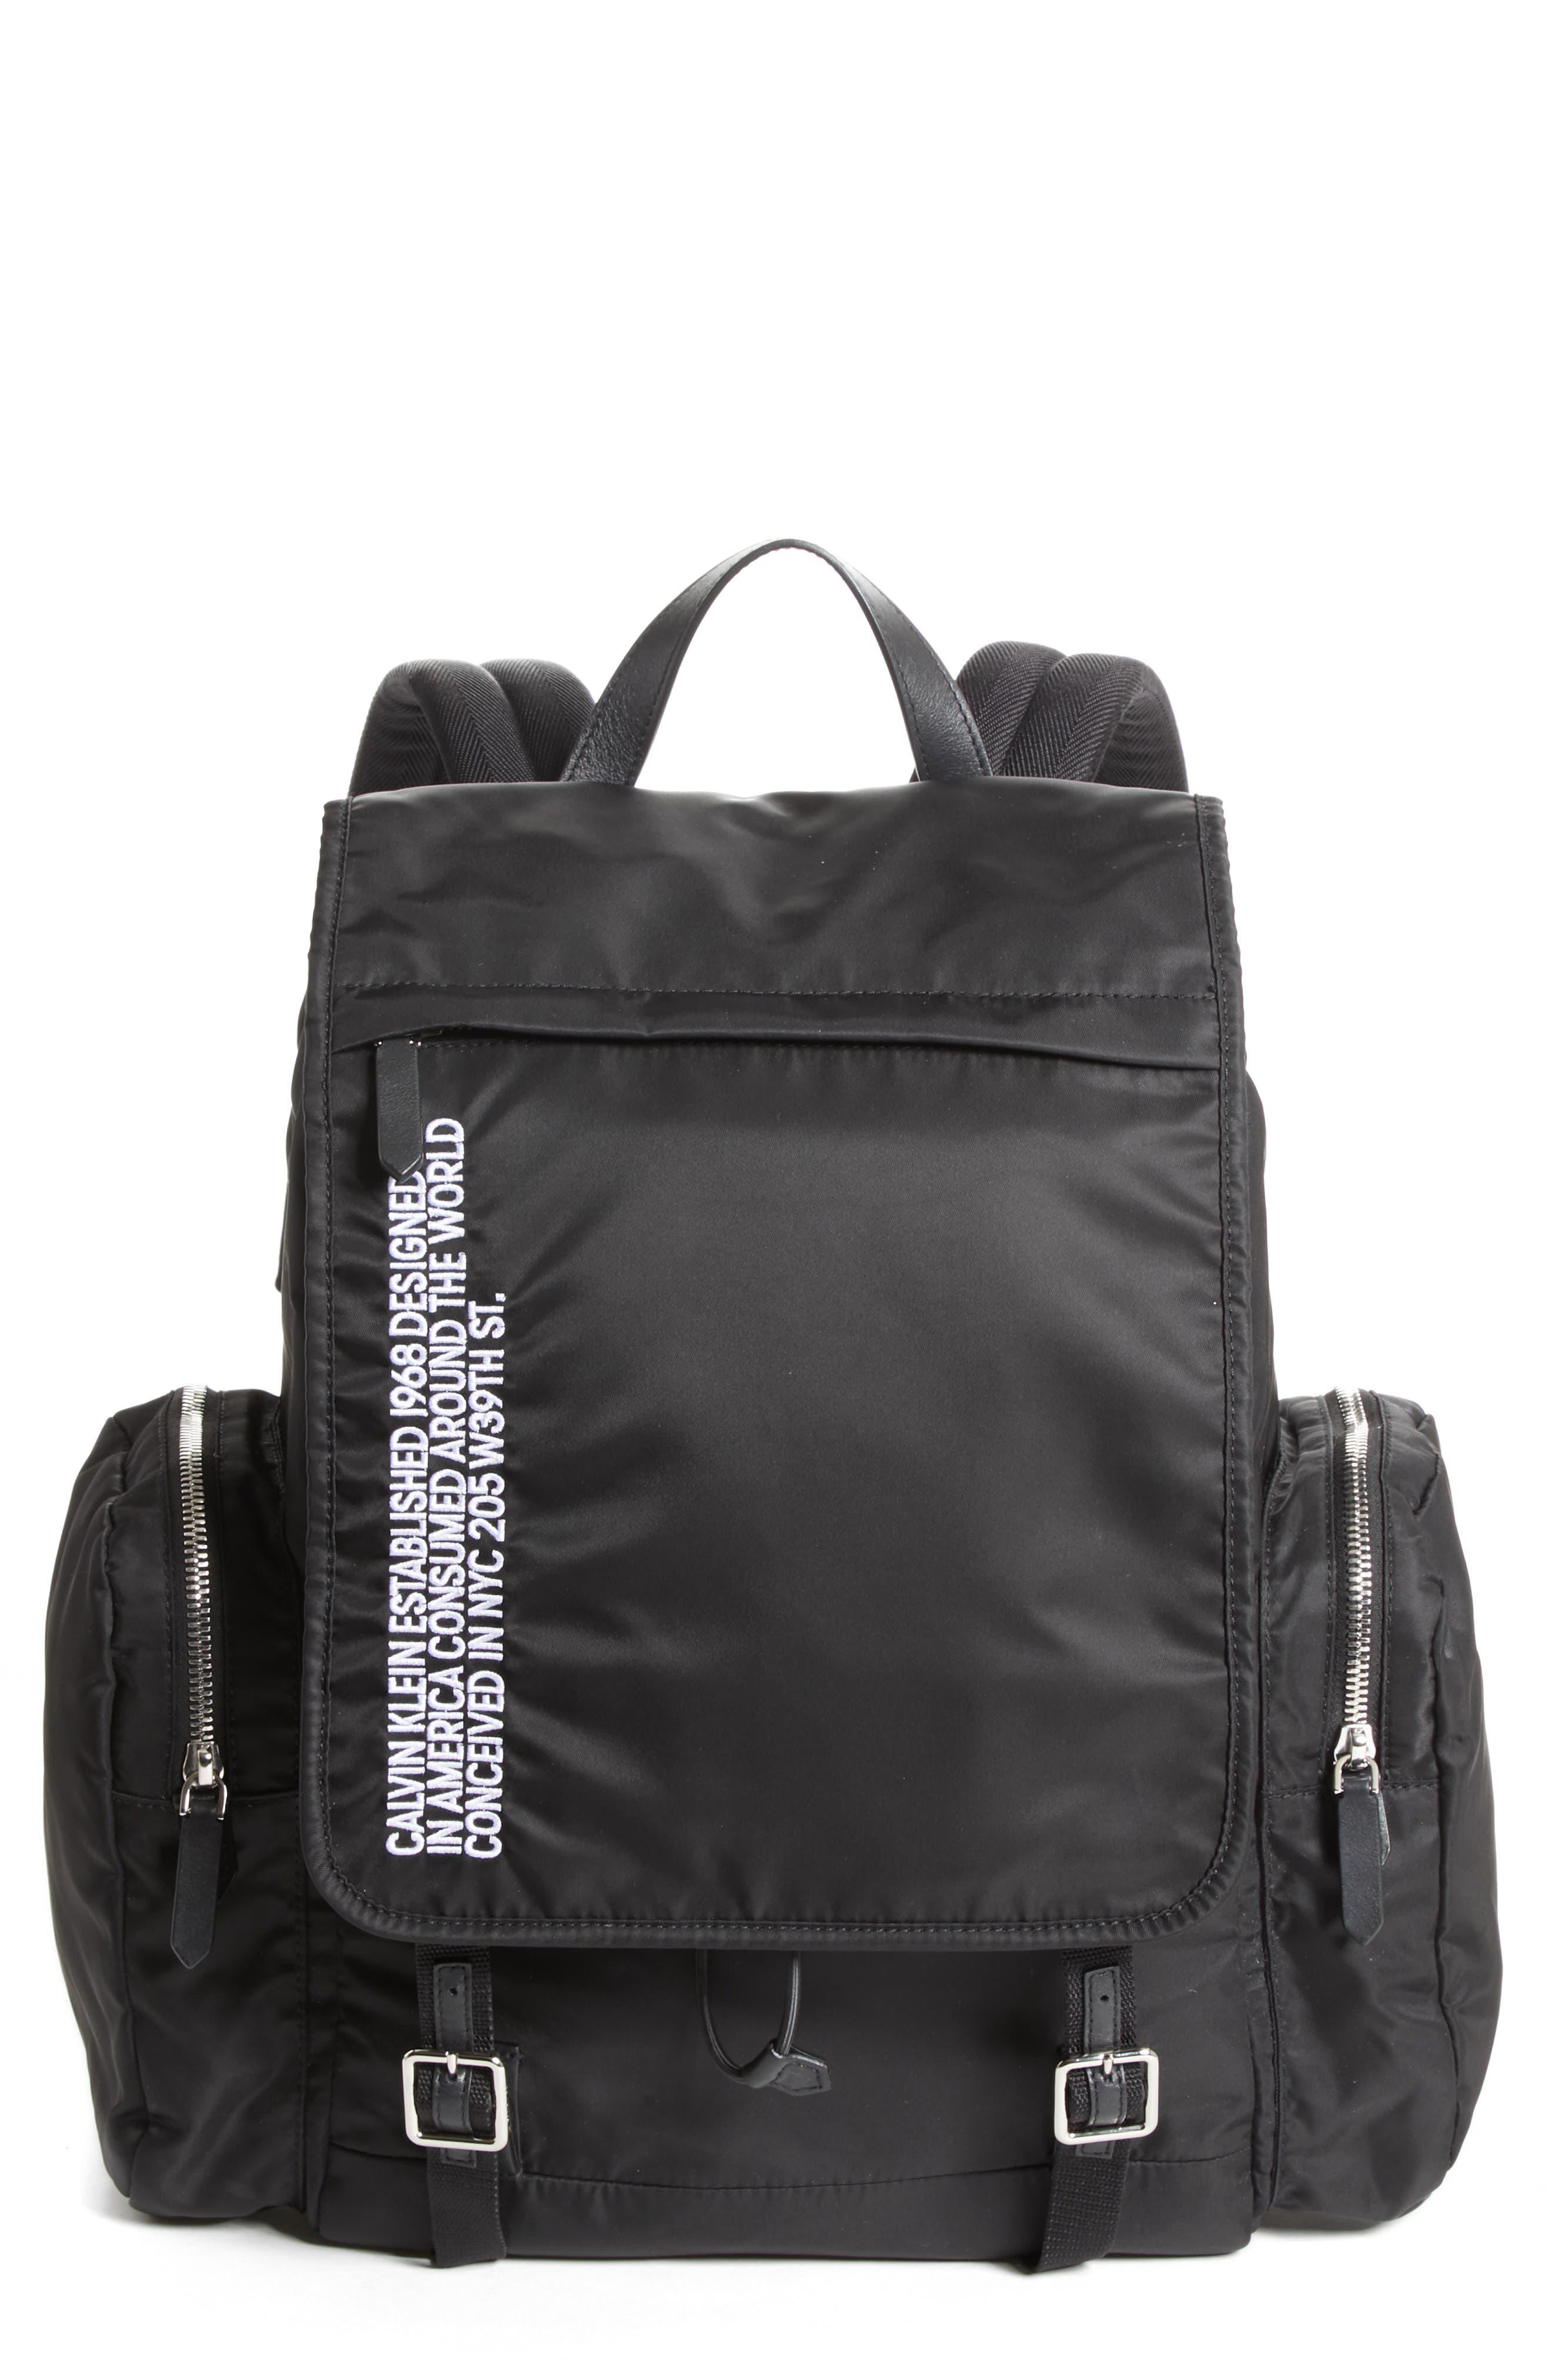 Nylon Flap Backpack,                             Main thumbnail 1, color,                             BLACK